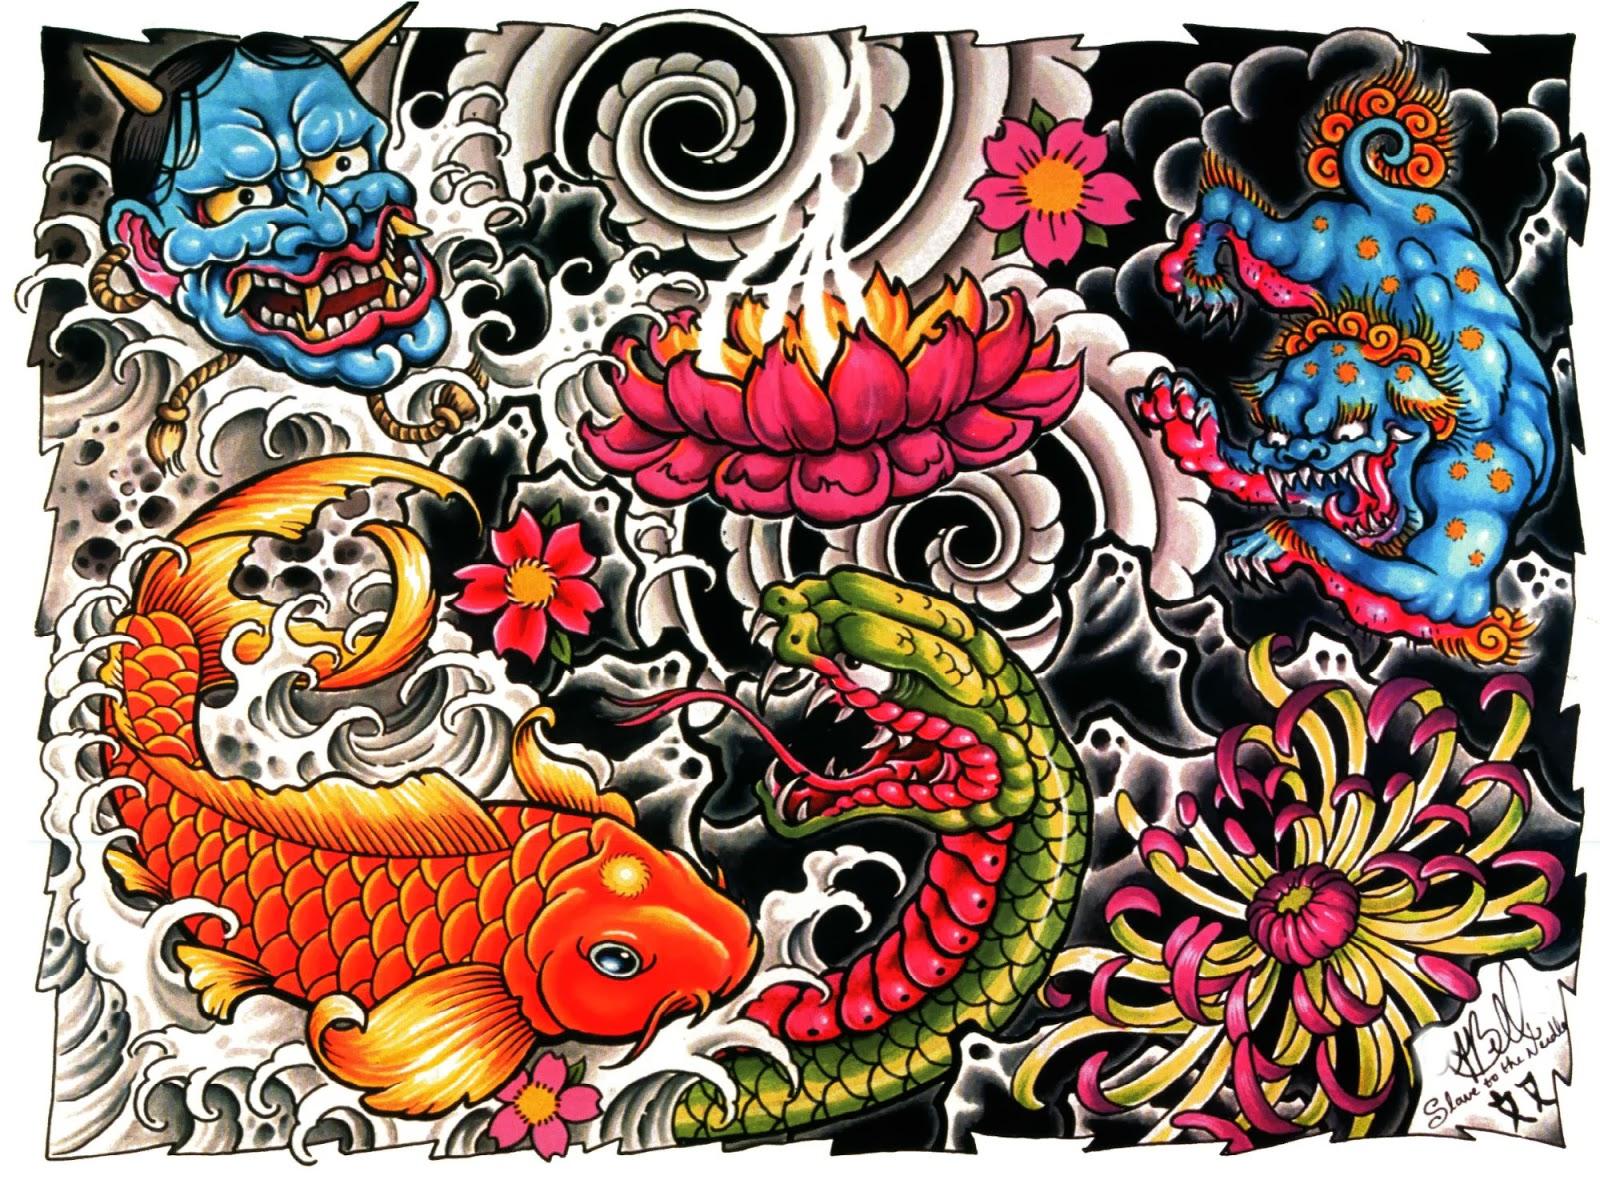 Tato Wallpapers 1600x1200